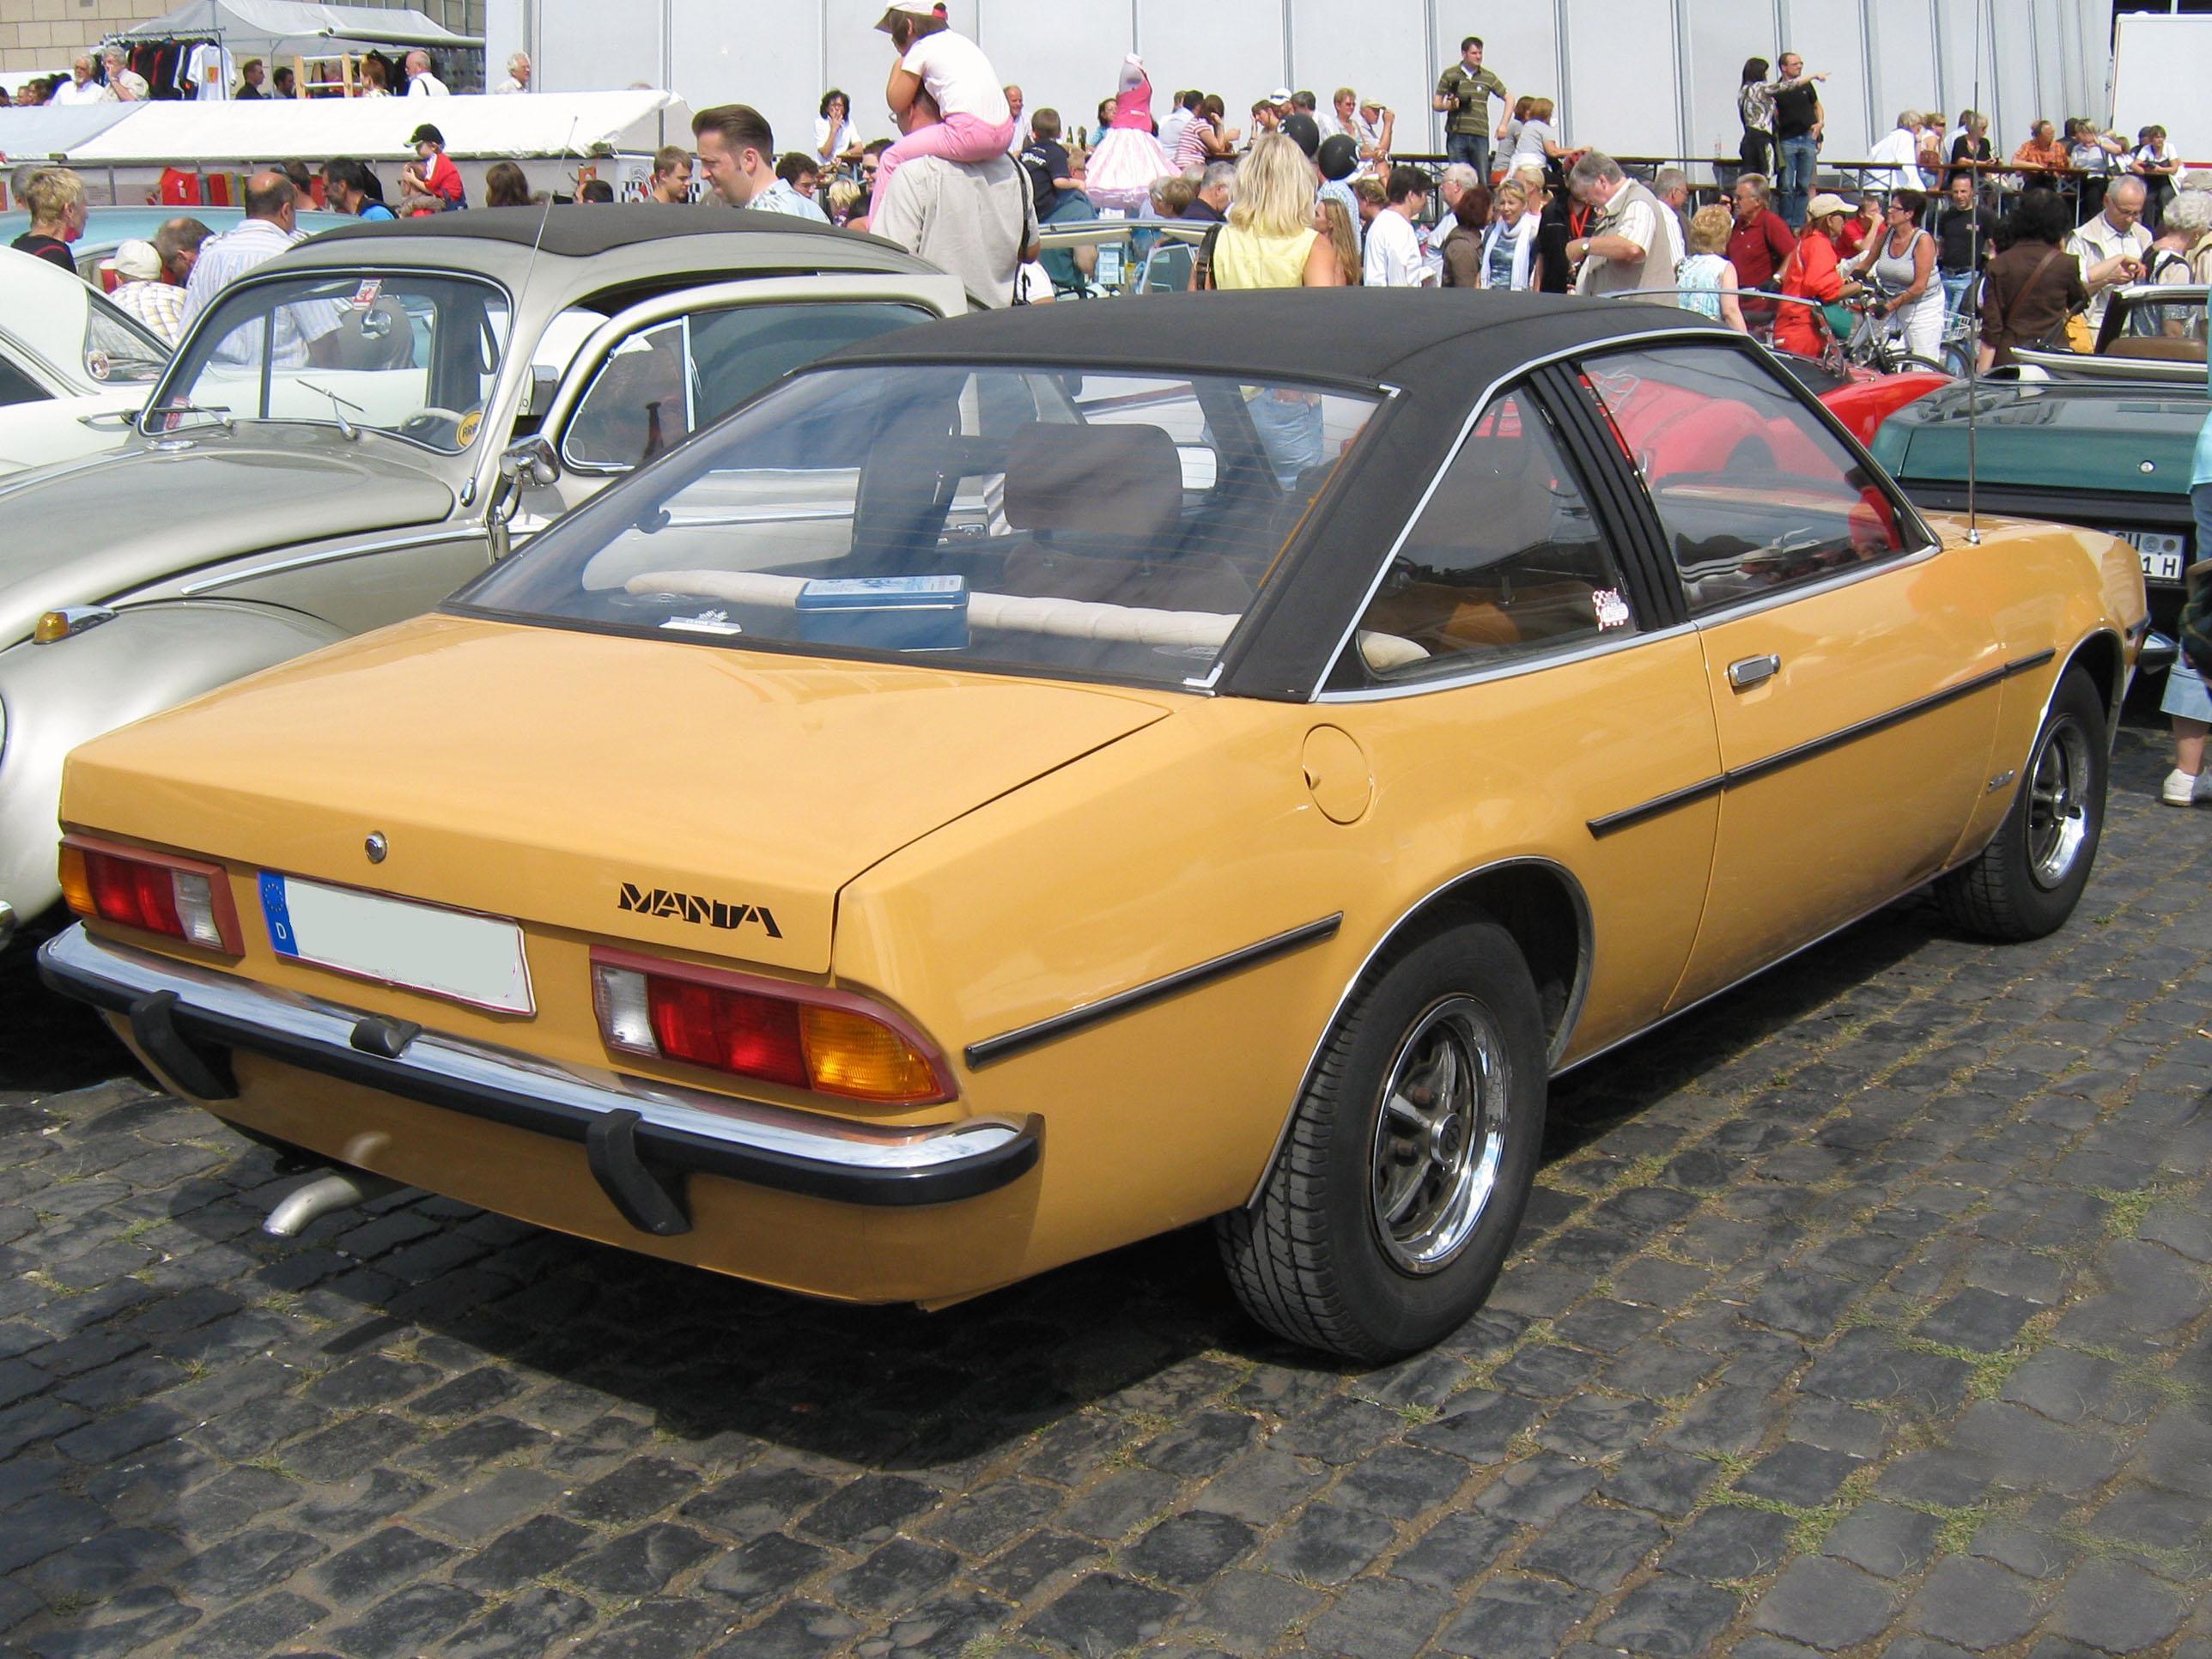 Opel Manta A 1970 - 1975 Coupe #2